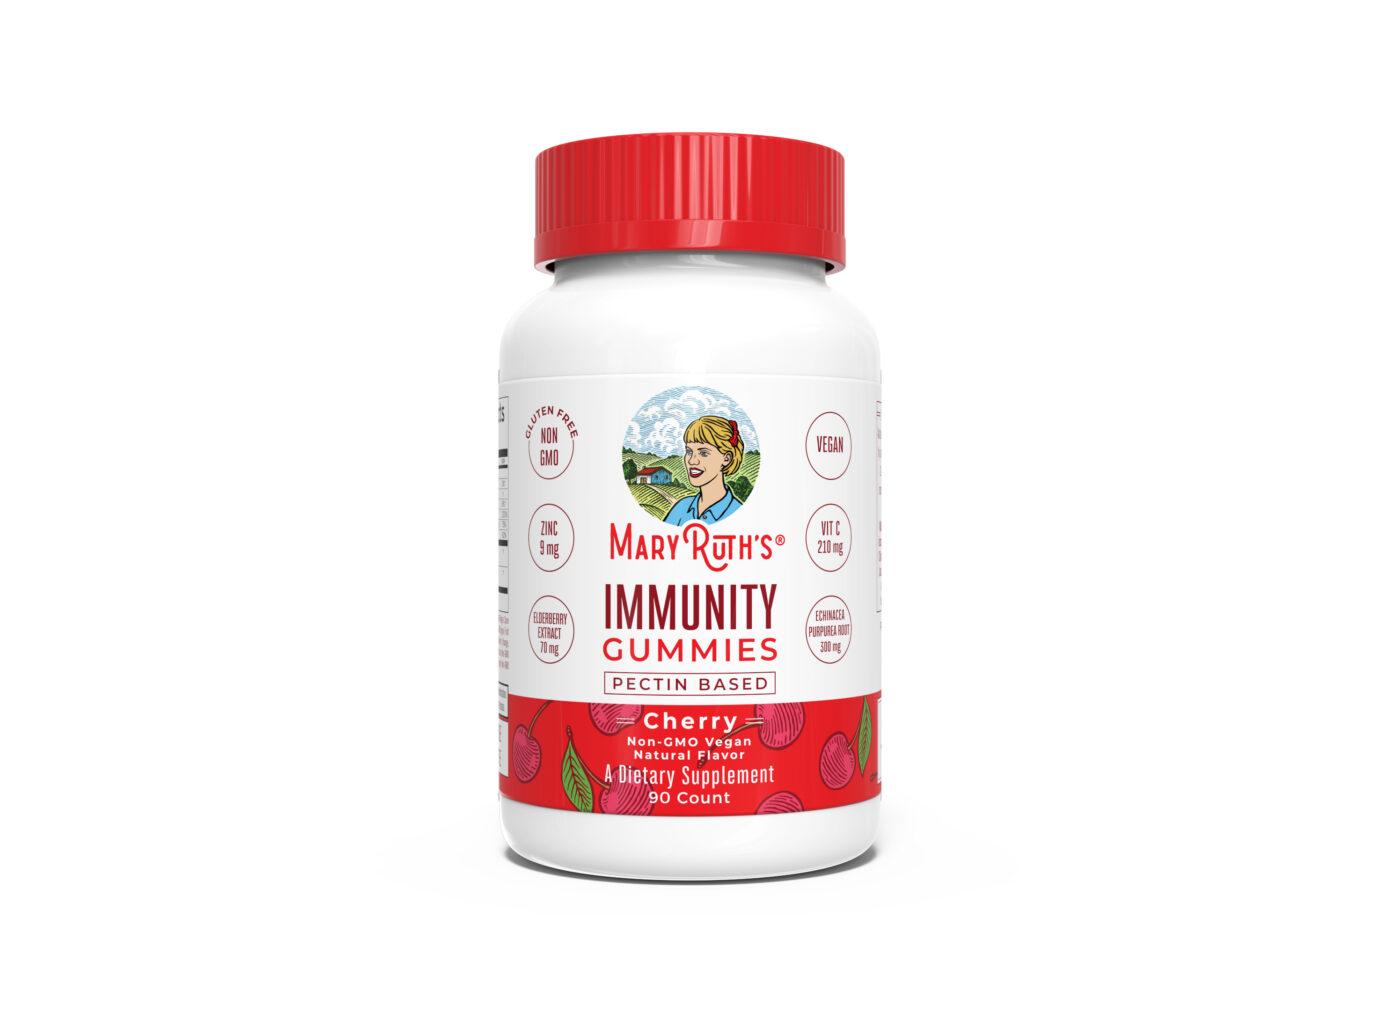 Mary Ruth's Immunity Gummies